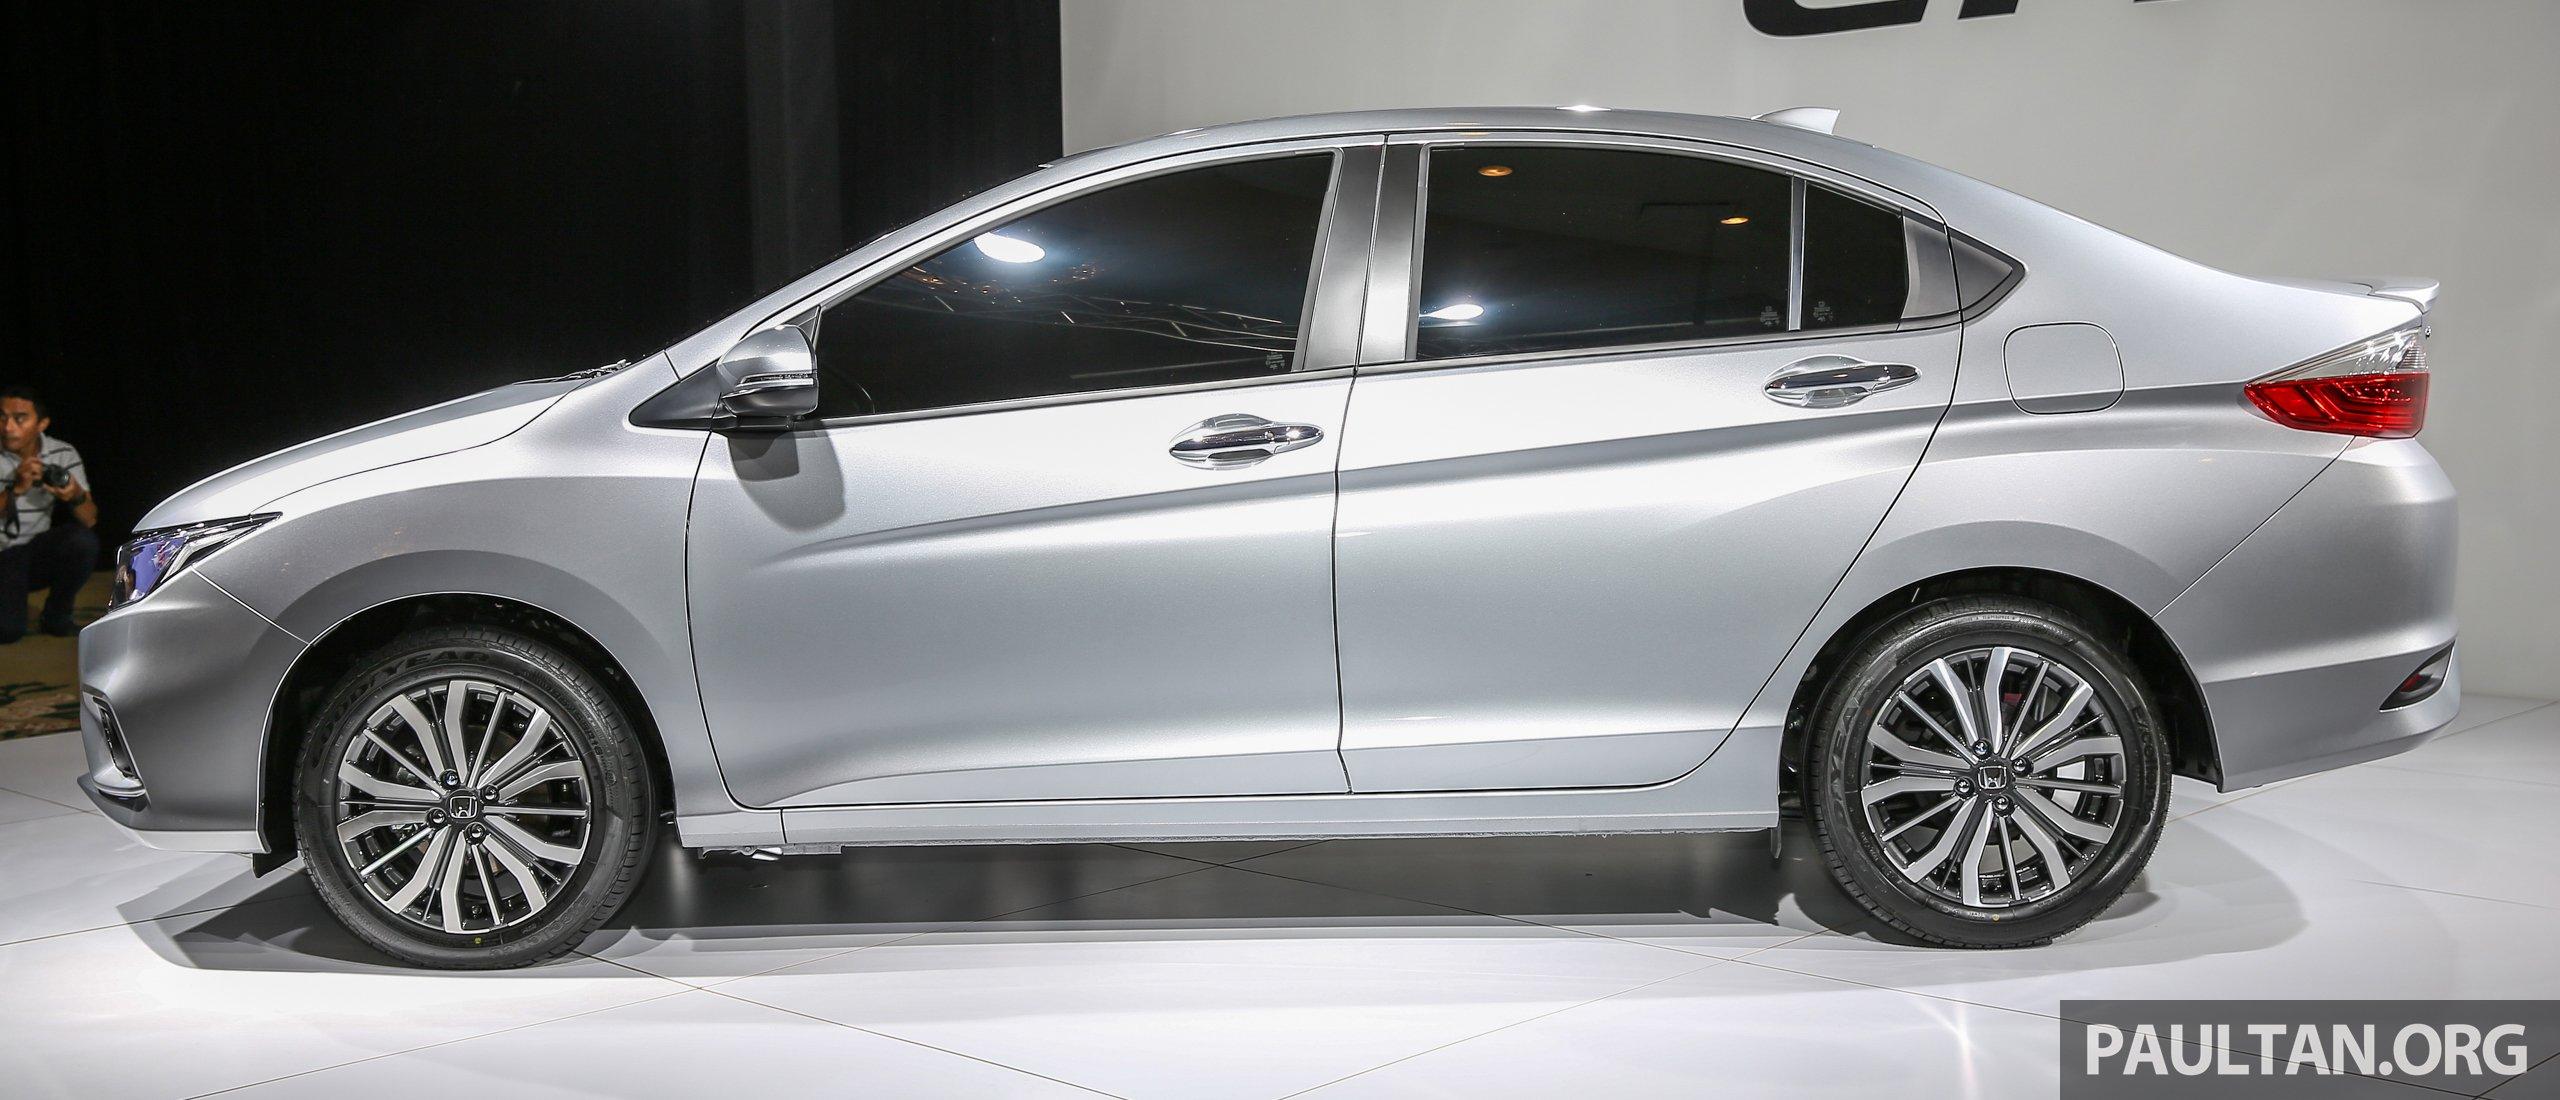 Ű�改款 Honda City Ɯ�地实车预览,内外配备全面升级。 Honda City Fl 7 Paul